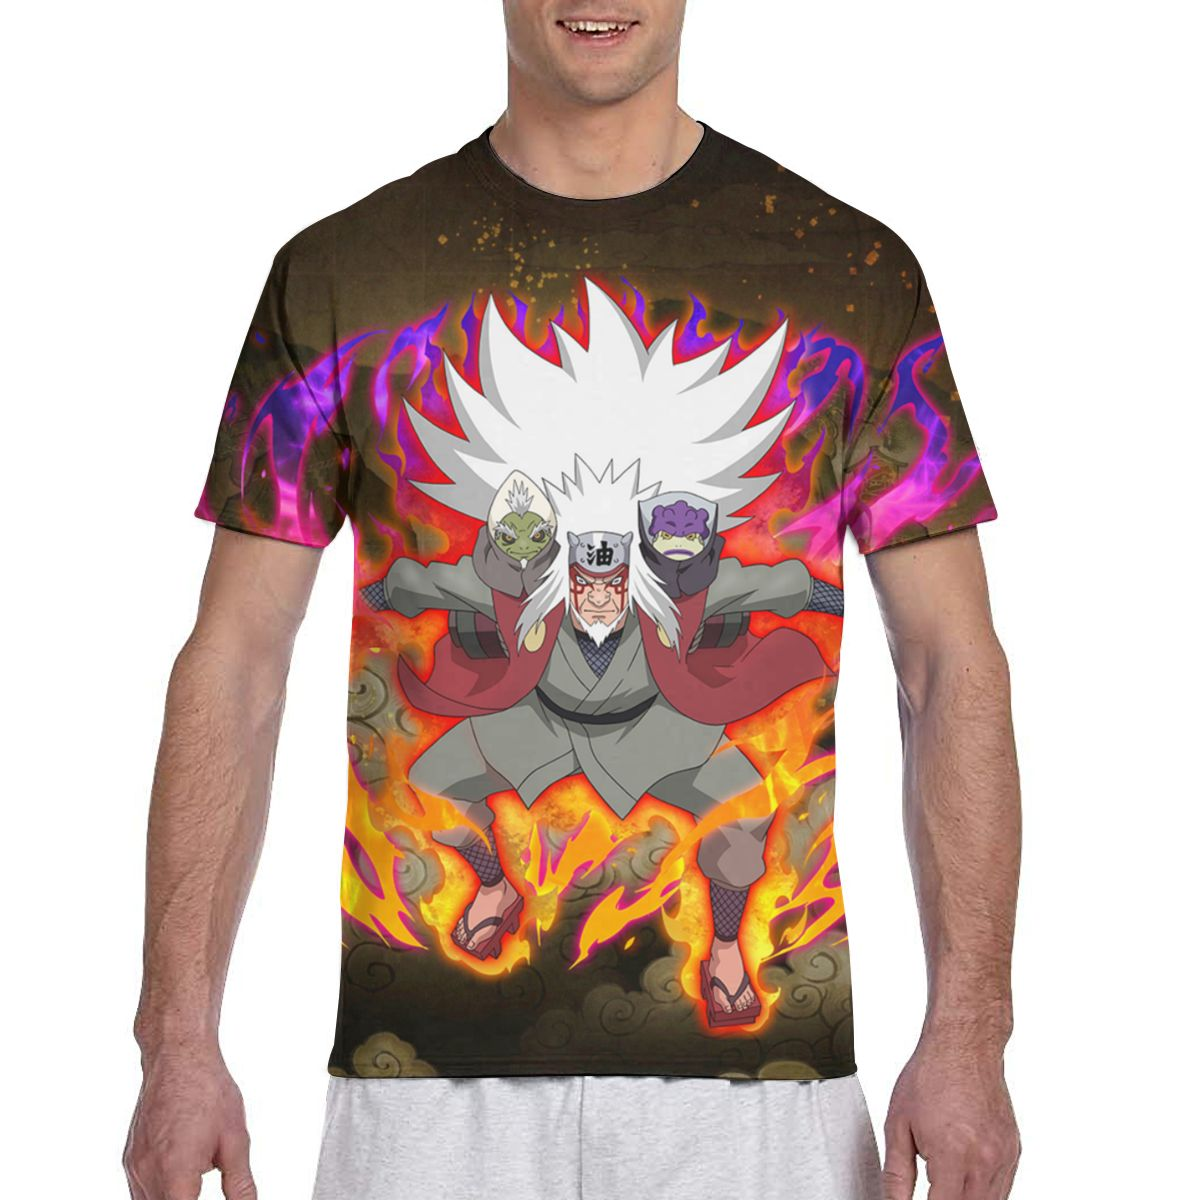 Jiraiya personalizado Anime japonés Naruto imprimir imagen de dibujos animados paiting hombres camiseta